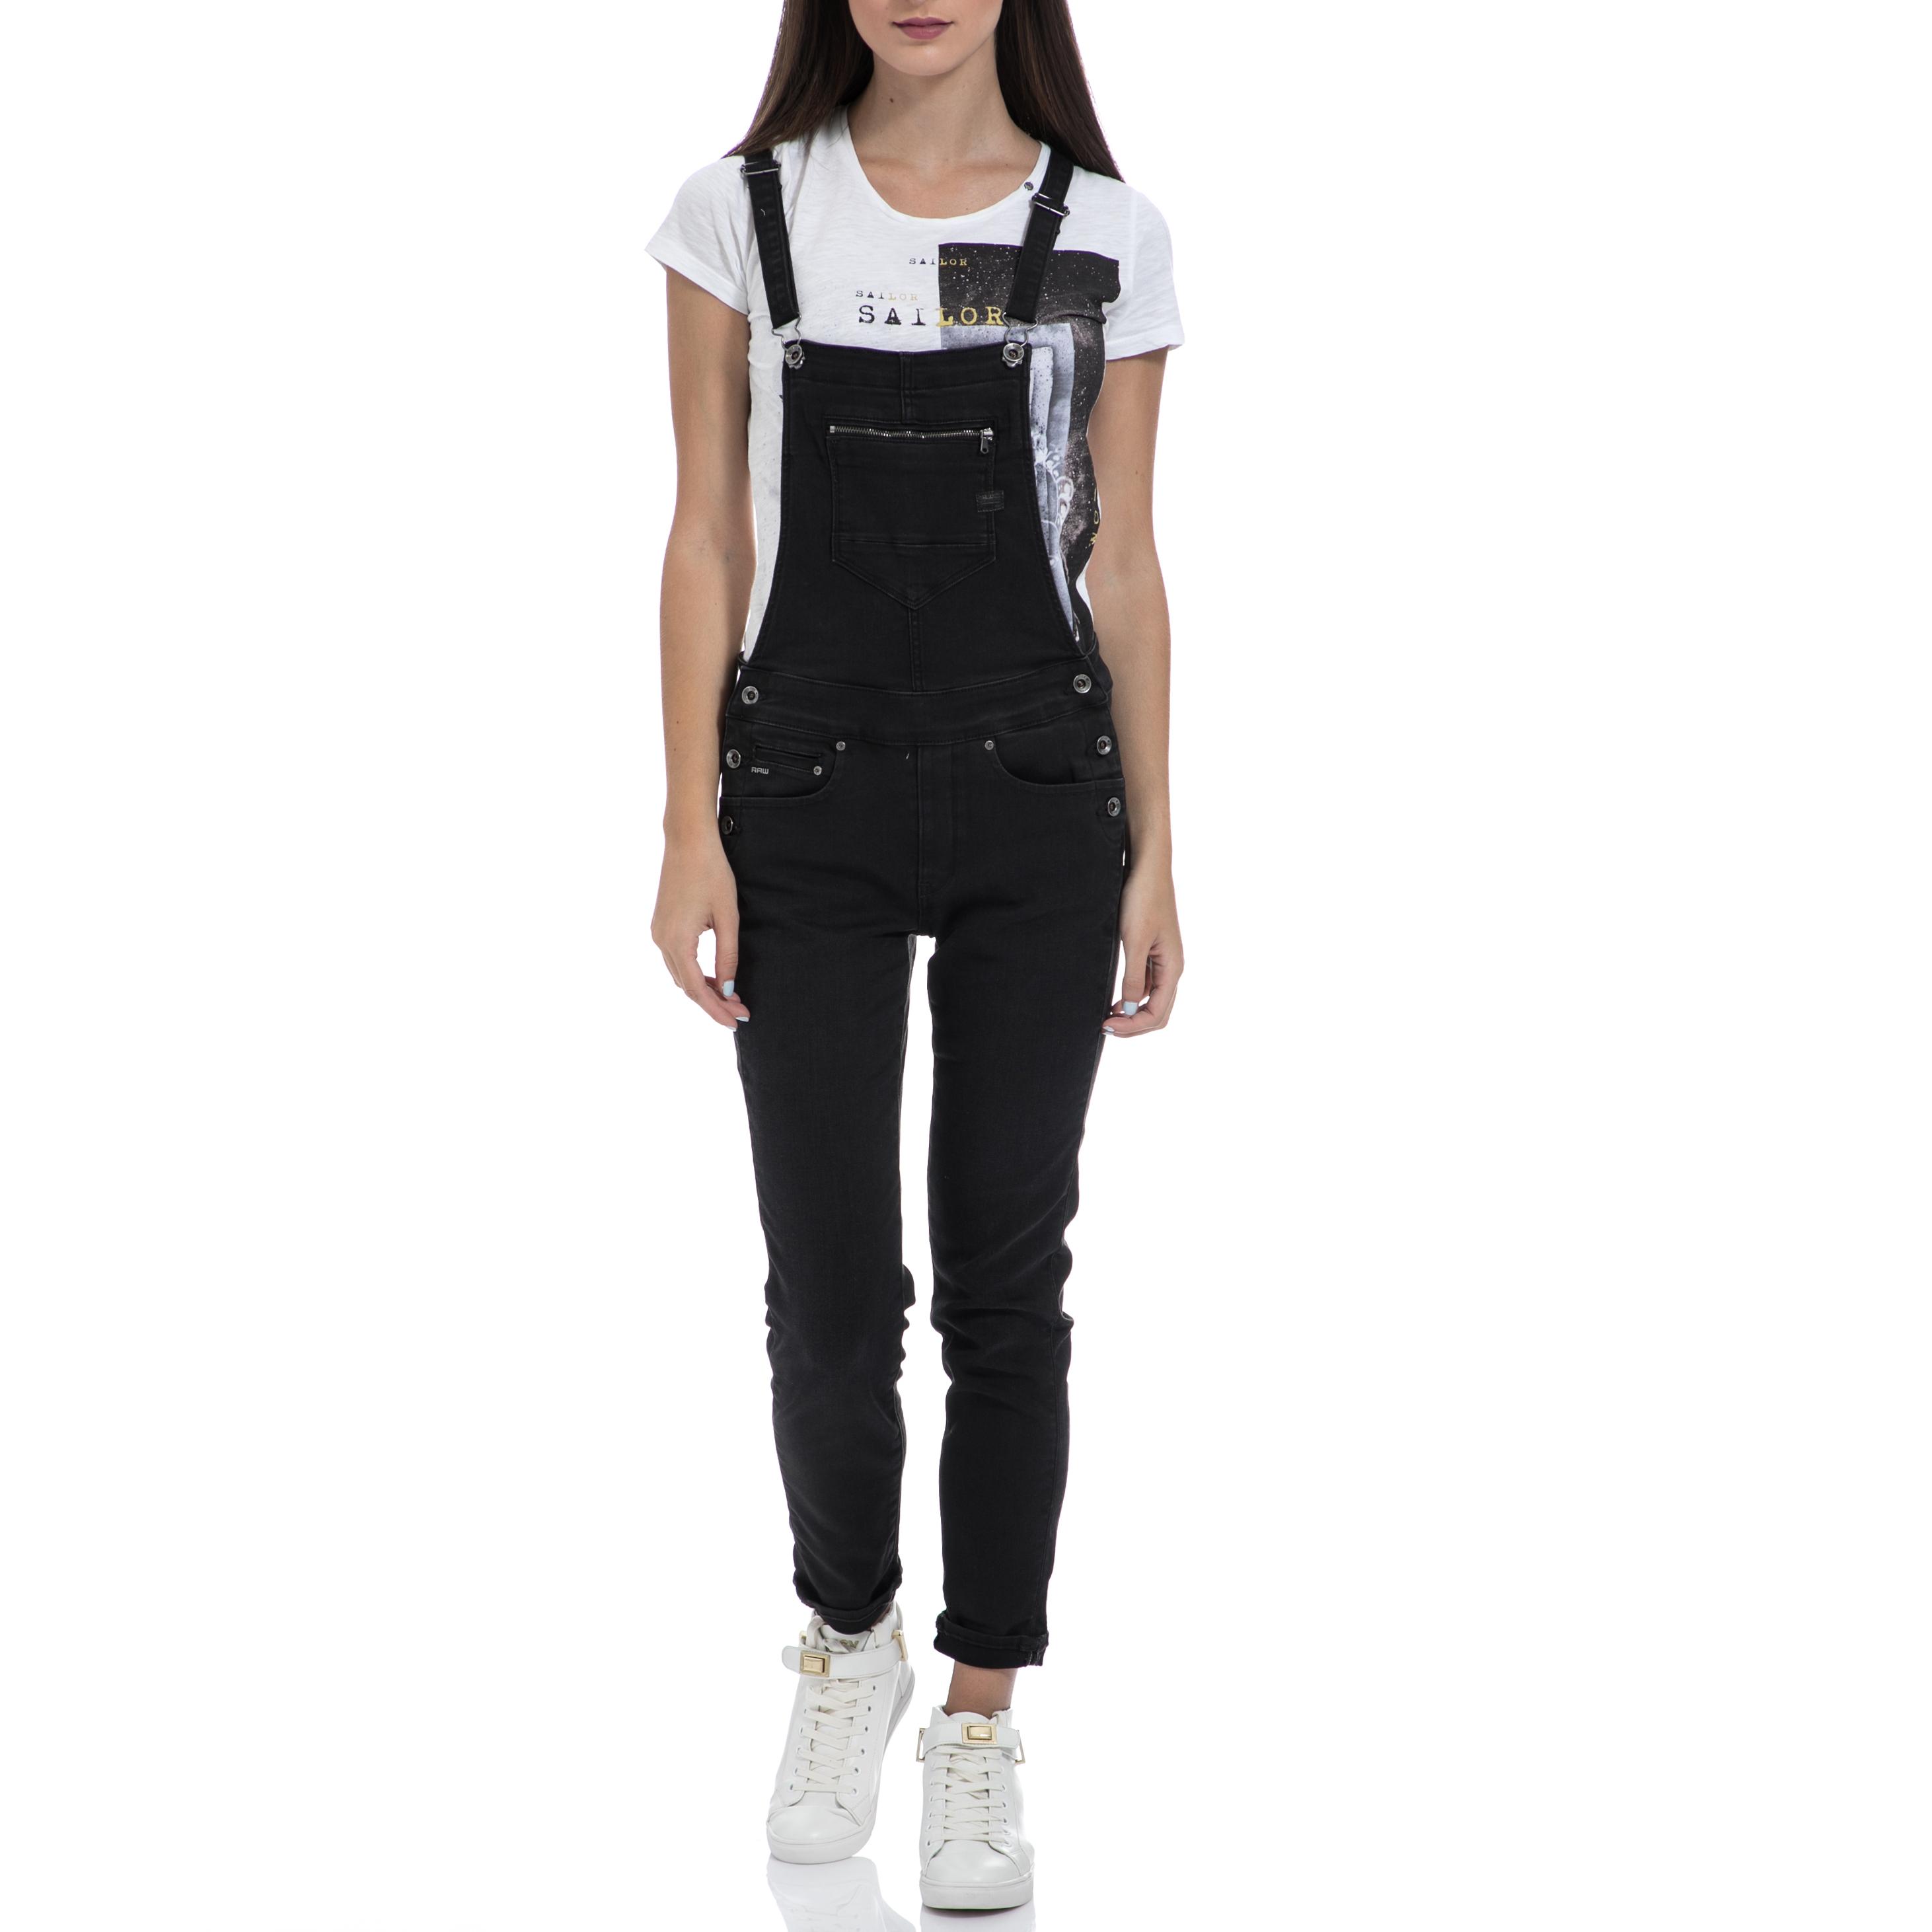 G-STAR RAW - Ολόσωμη φόρμα G-STAR RAW μαύρη γυναικεία ρούχα ολόσωμες φόρμες